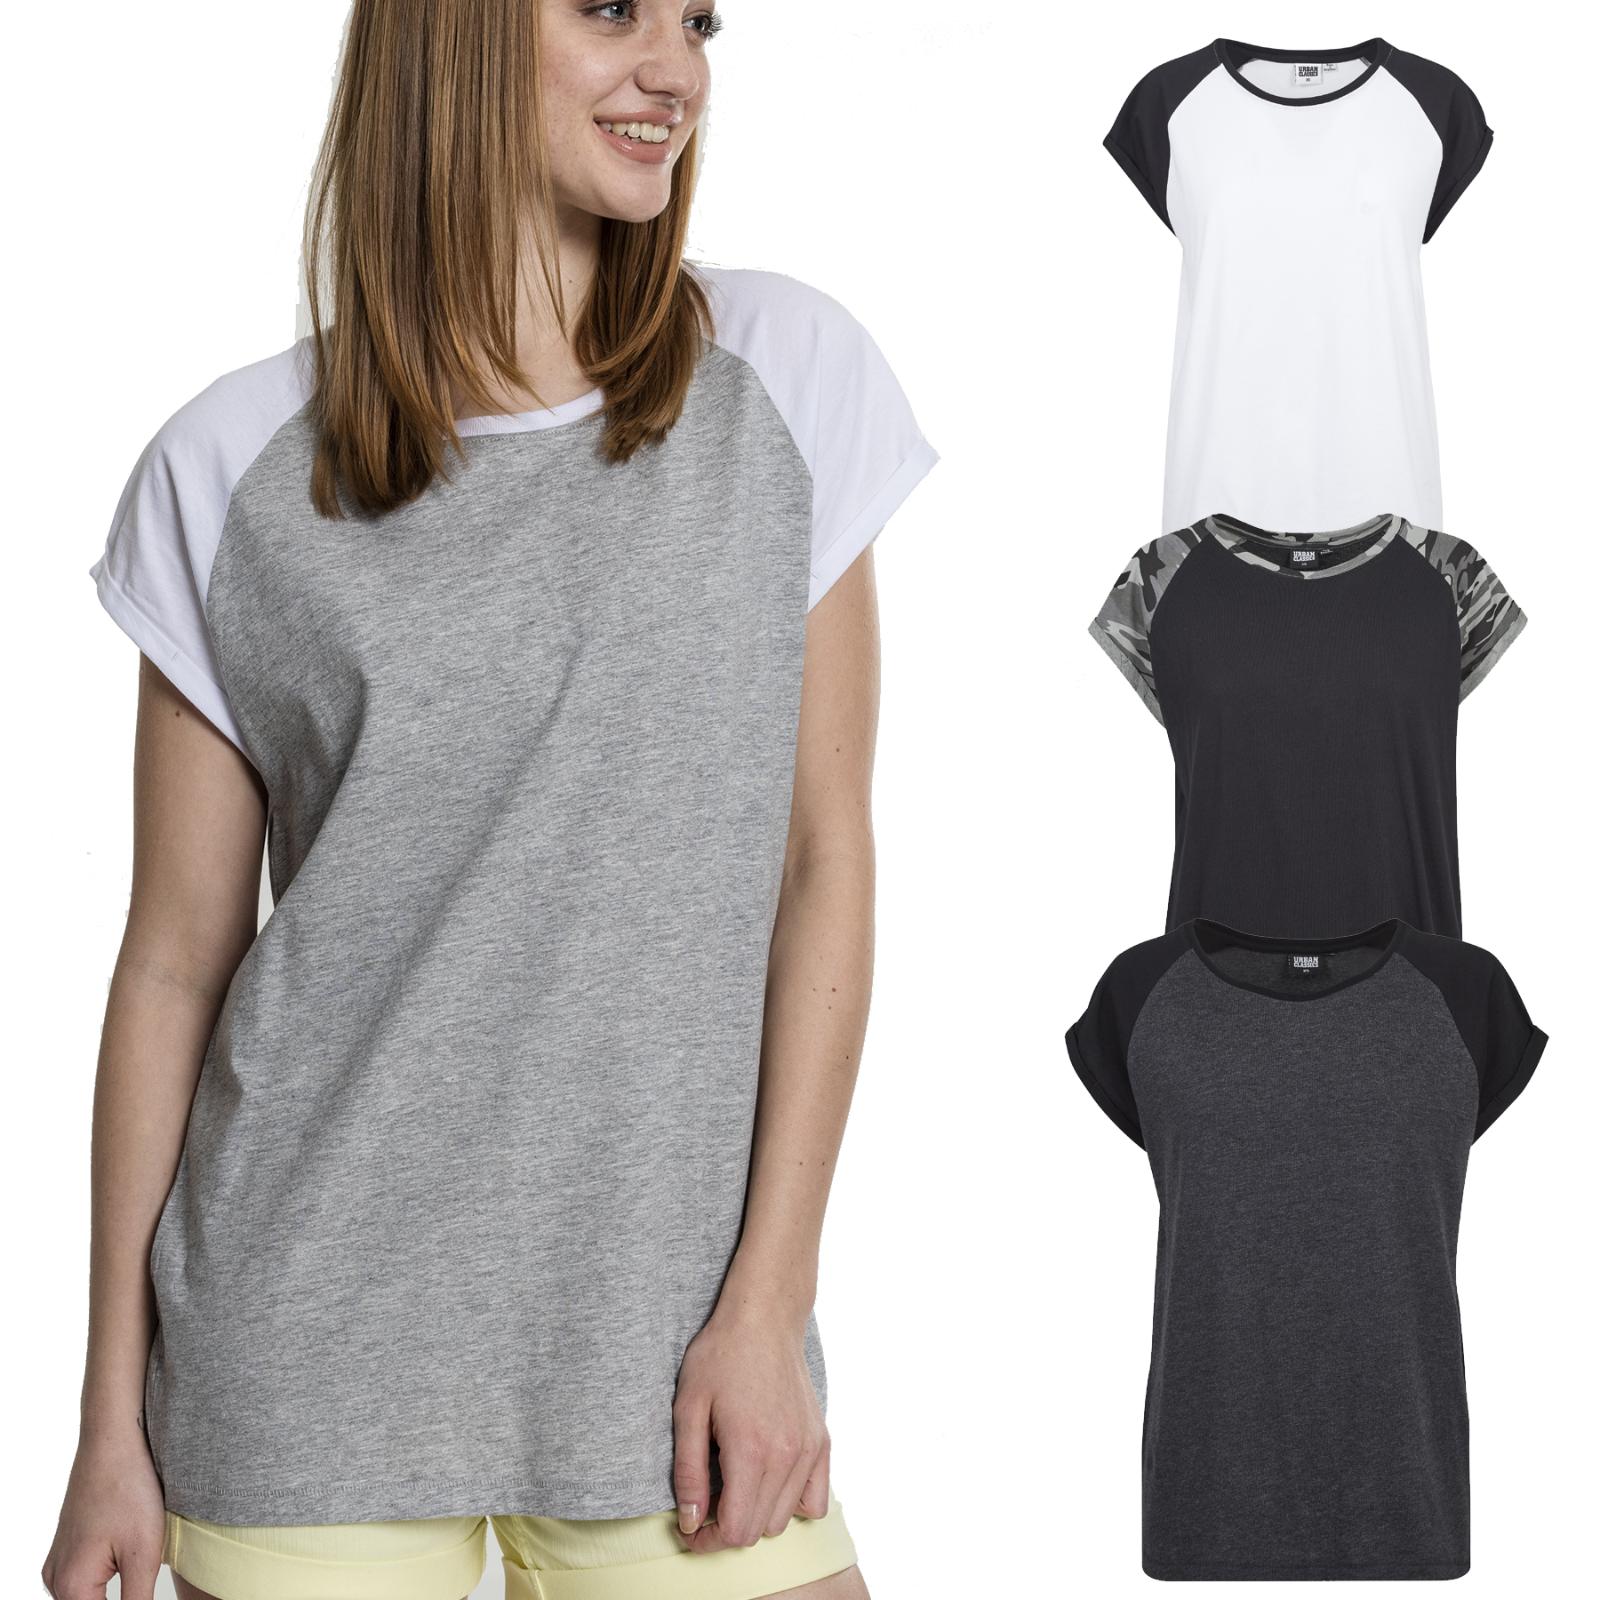 Urban Classics Ladies Contrast Raglan T-Shirt Damen Baseball Locker Luftig